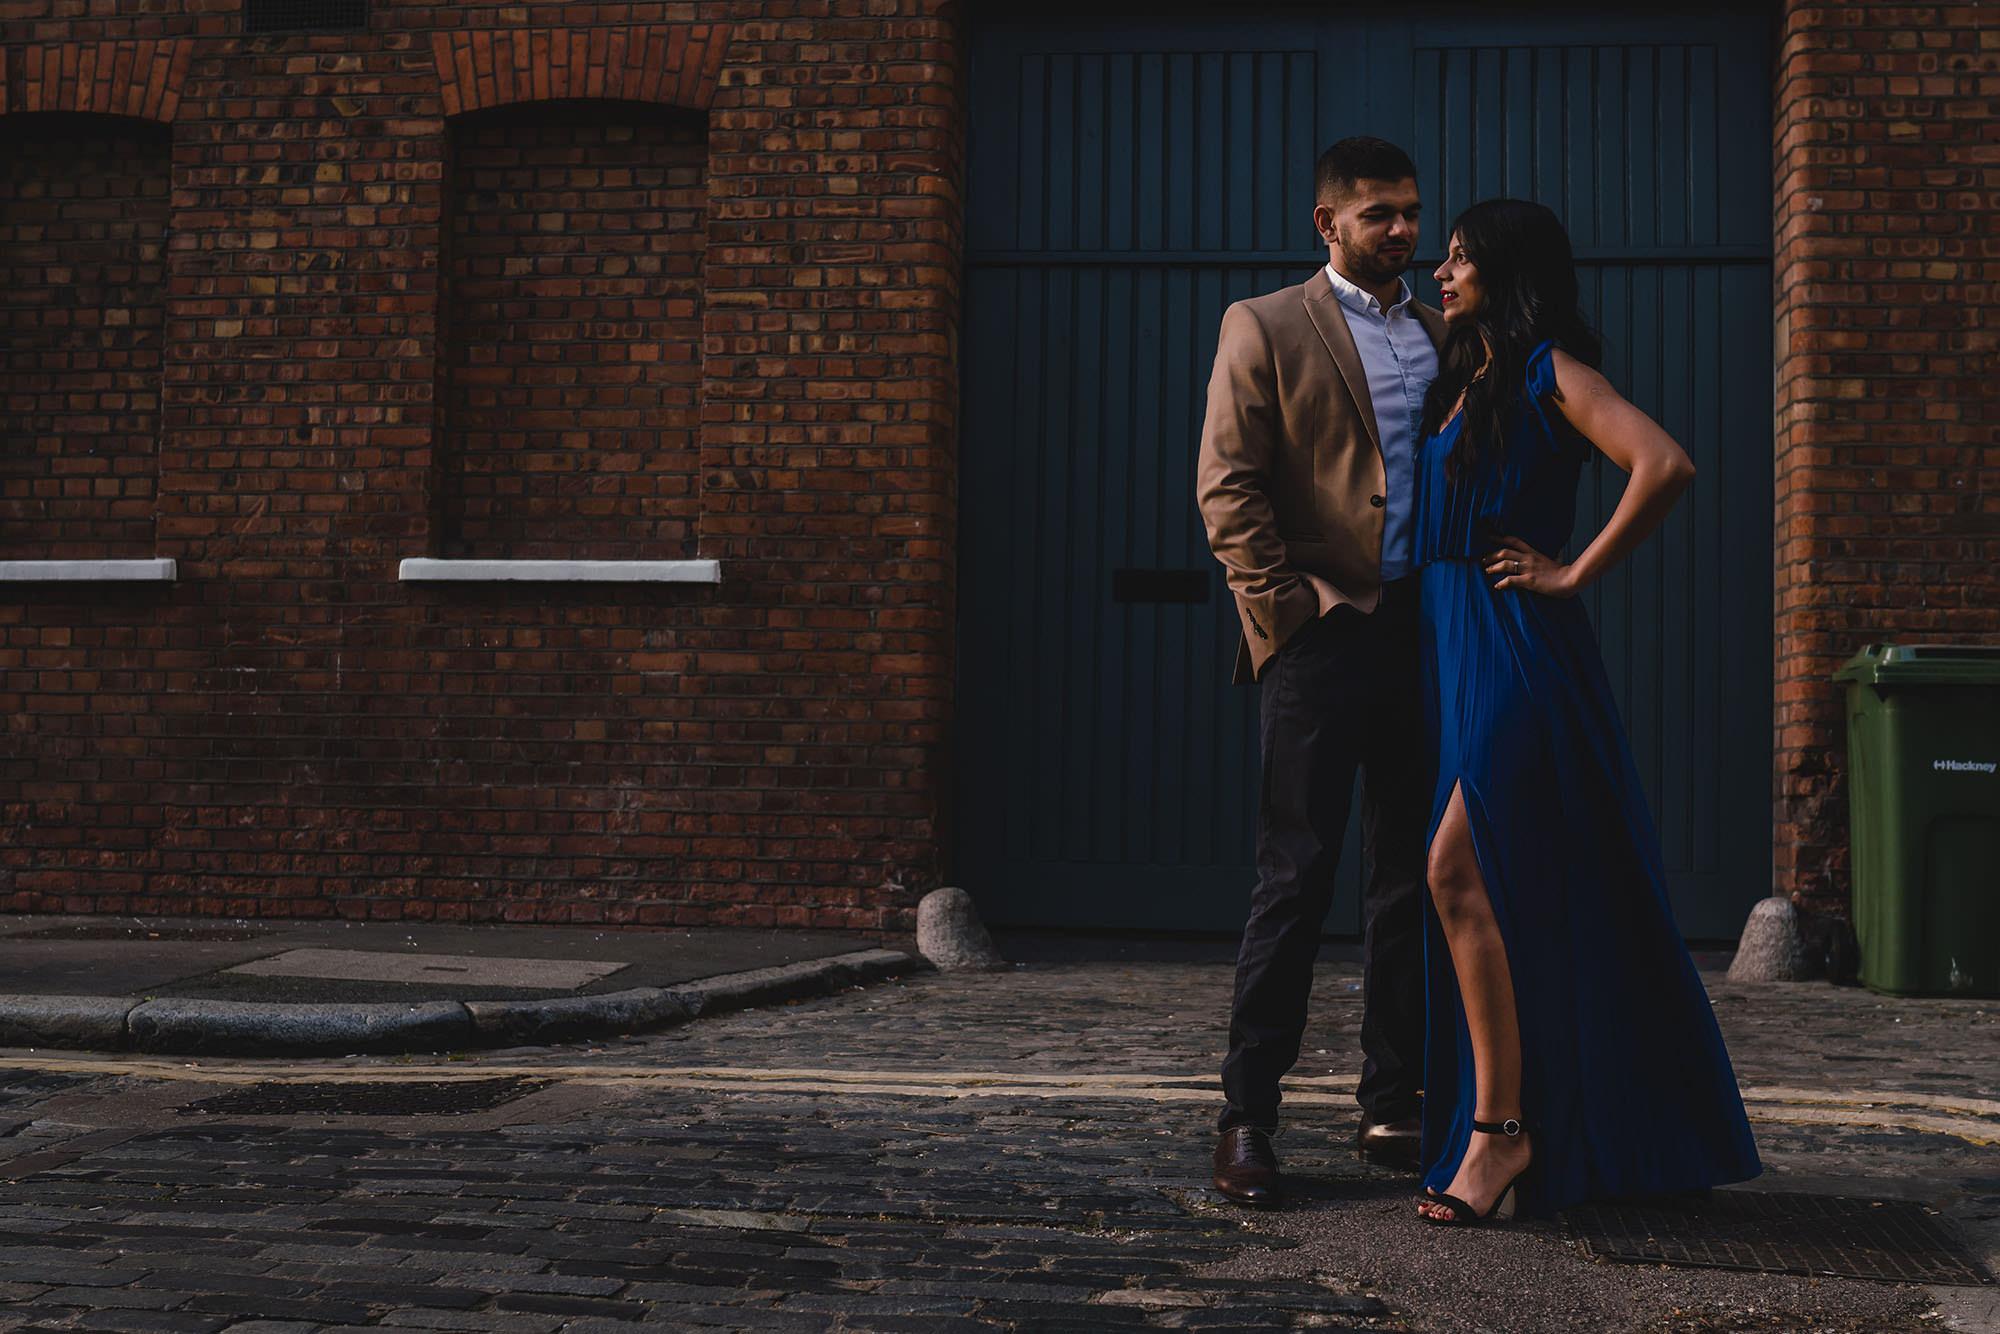 prewedding shoot central london posed portrait devan jigna